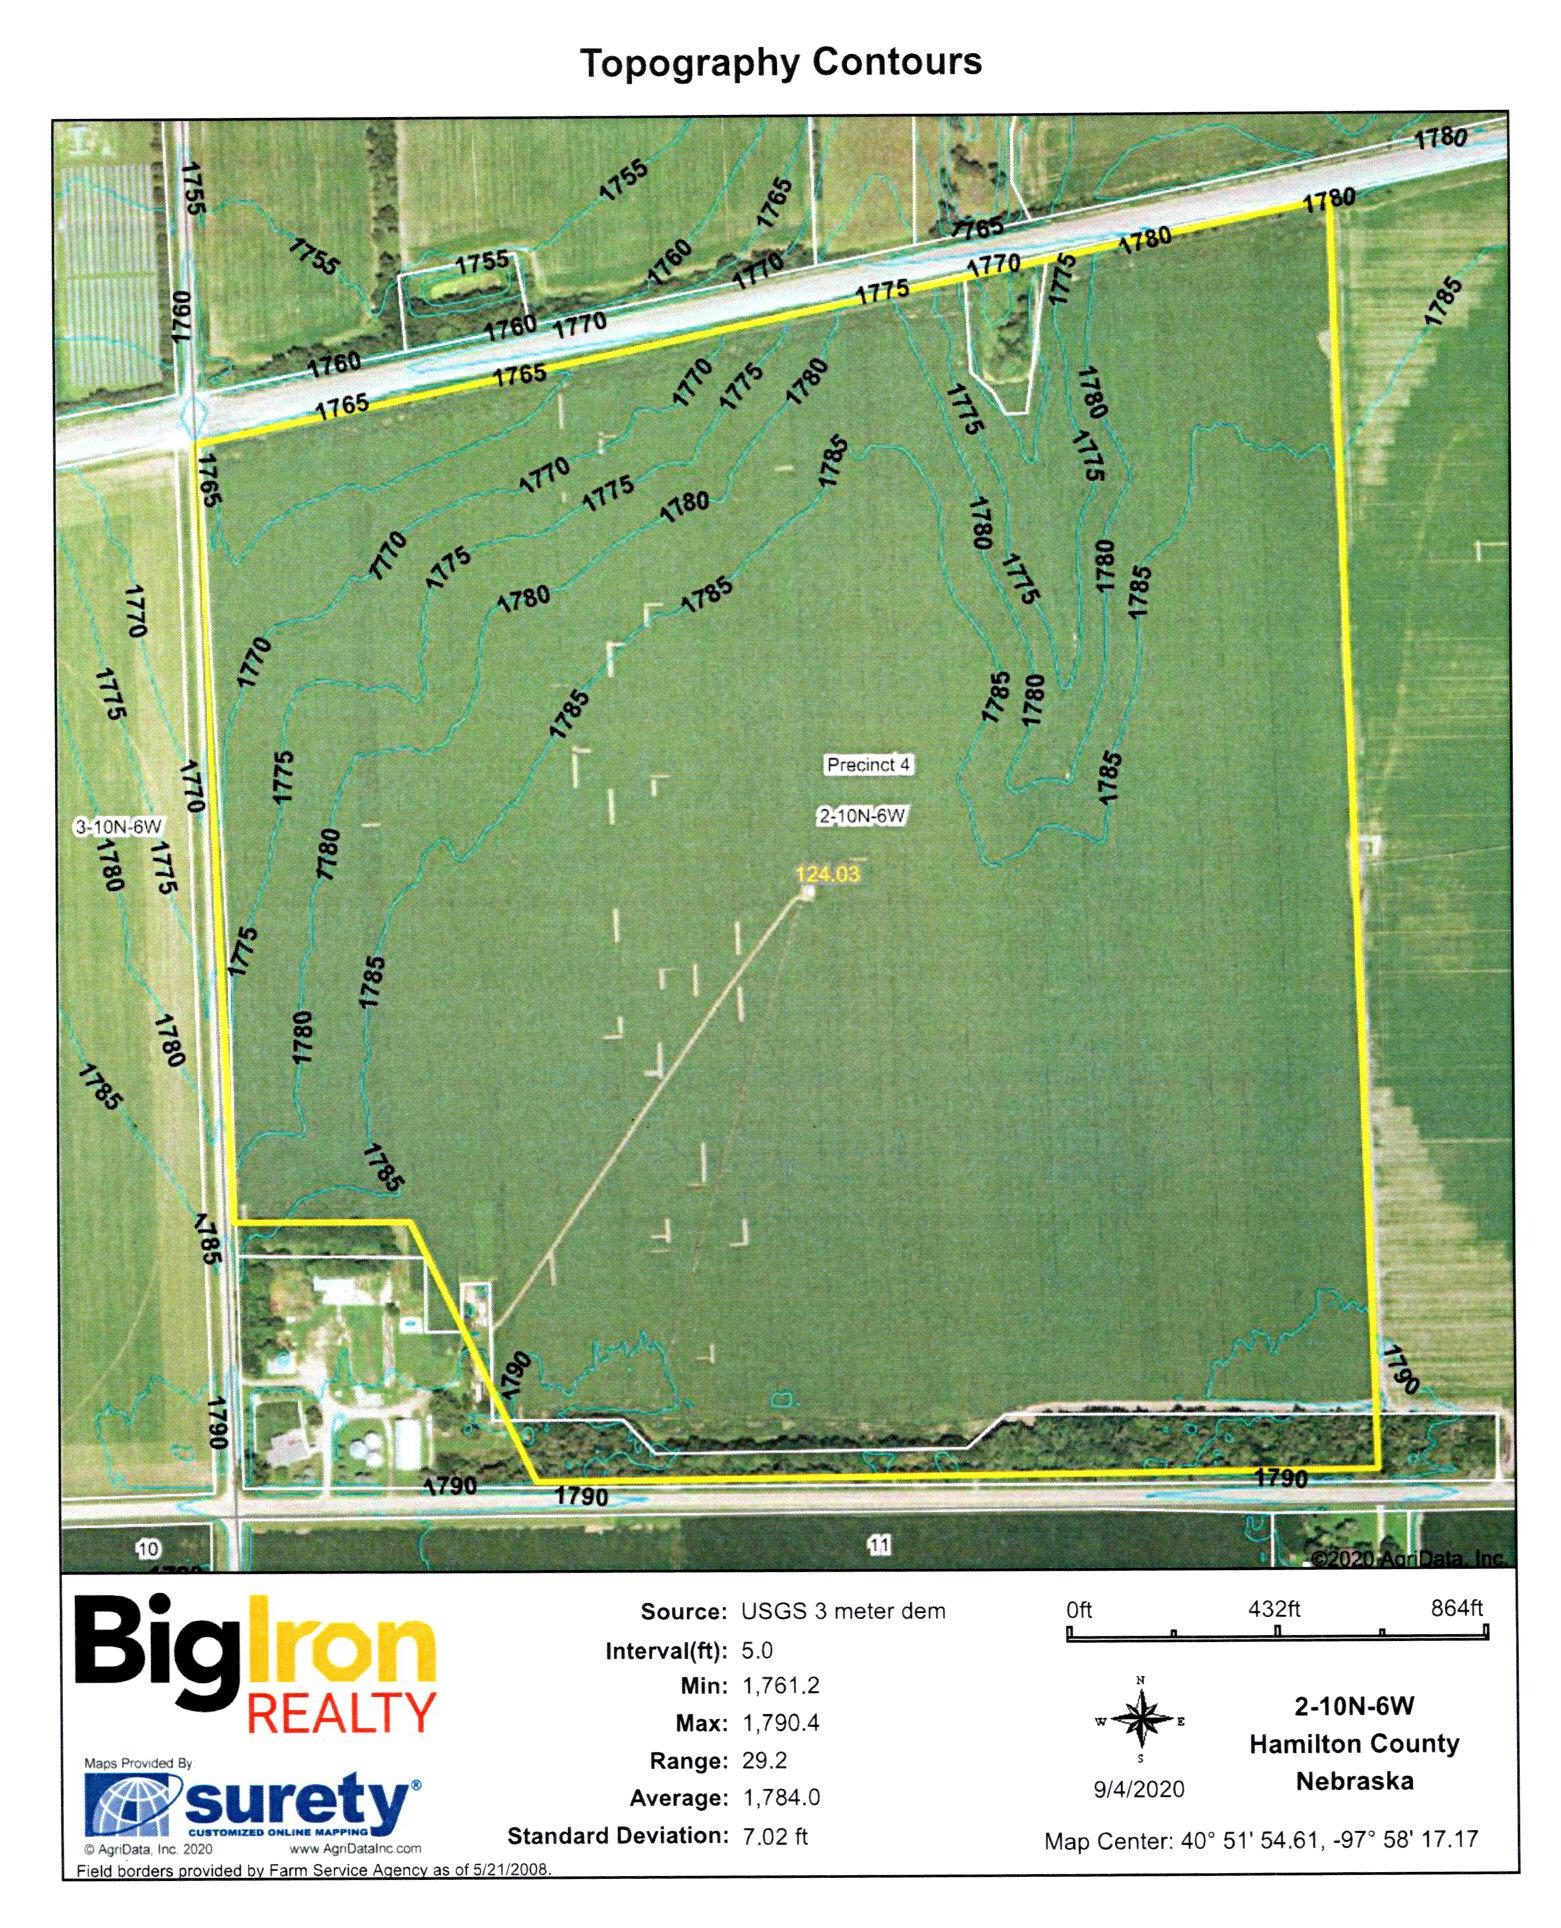 Topography Contours 3-BIR104